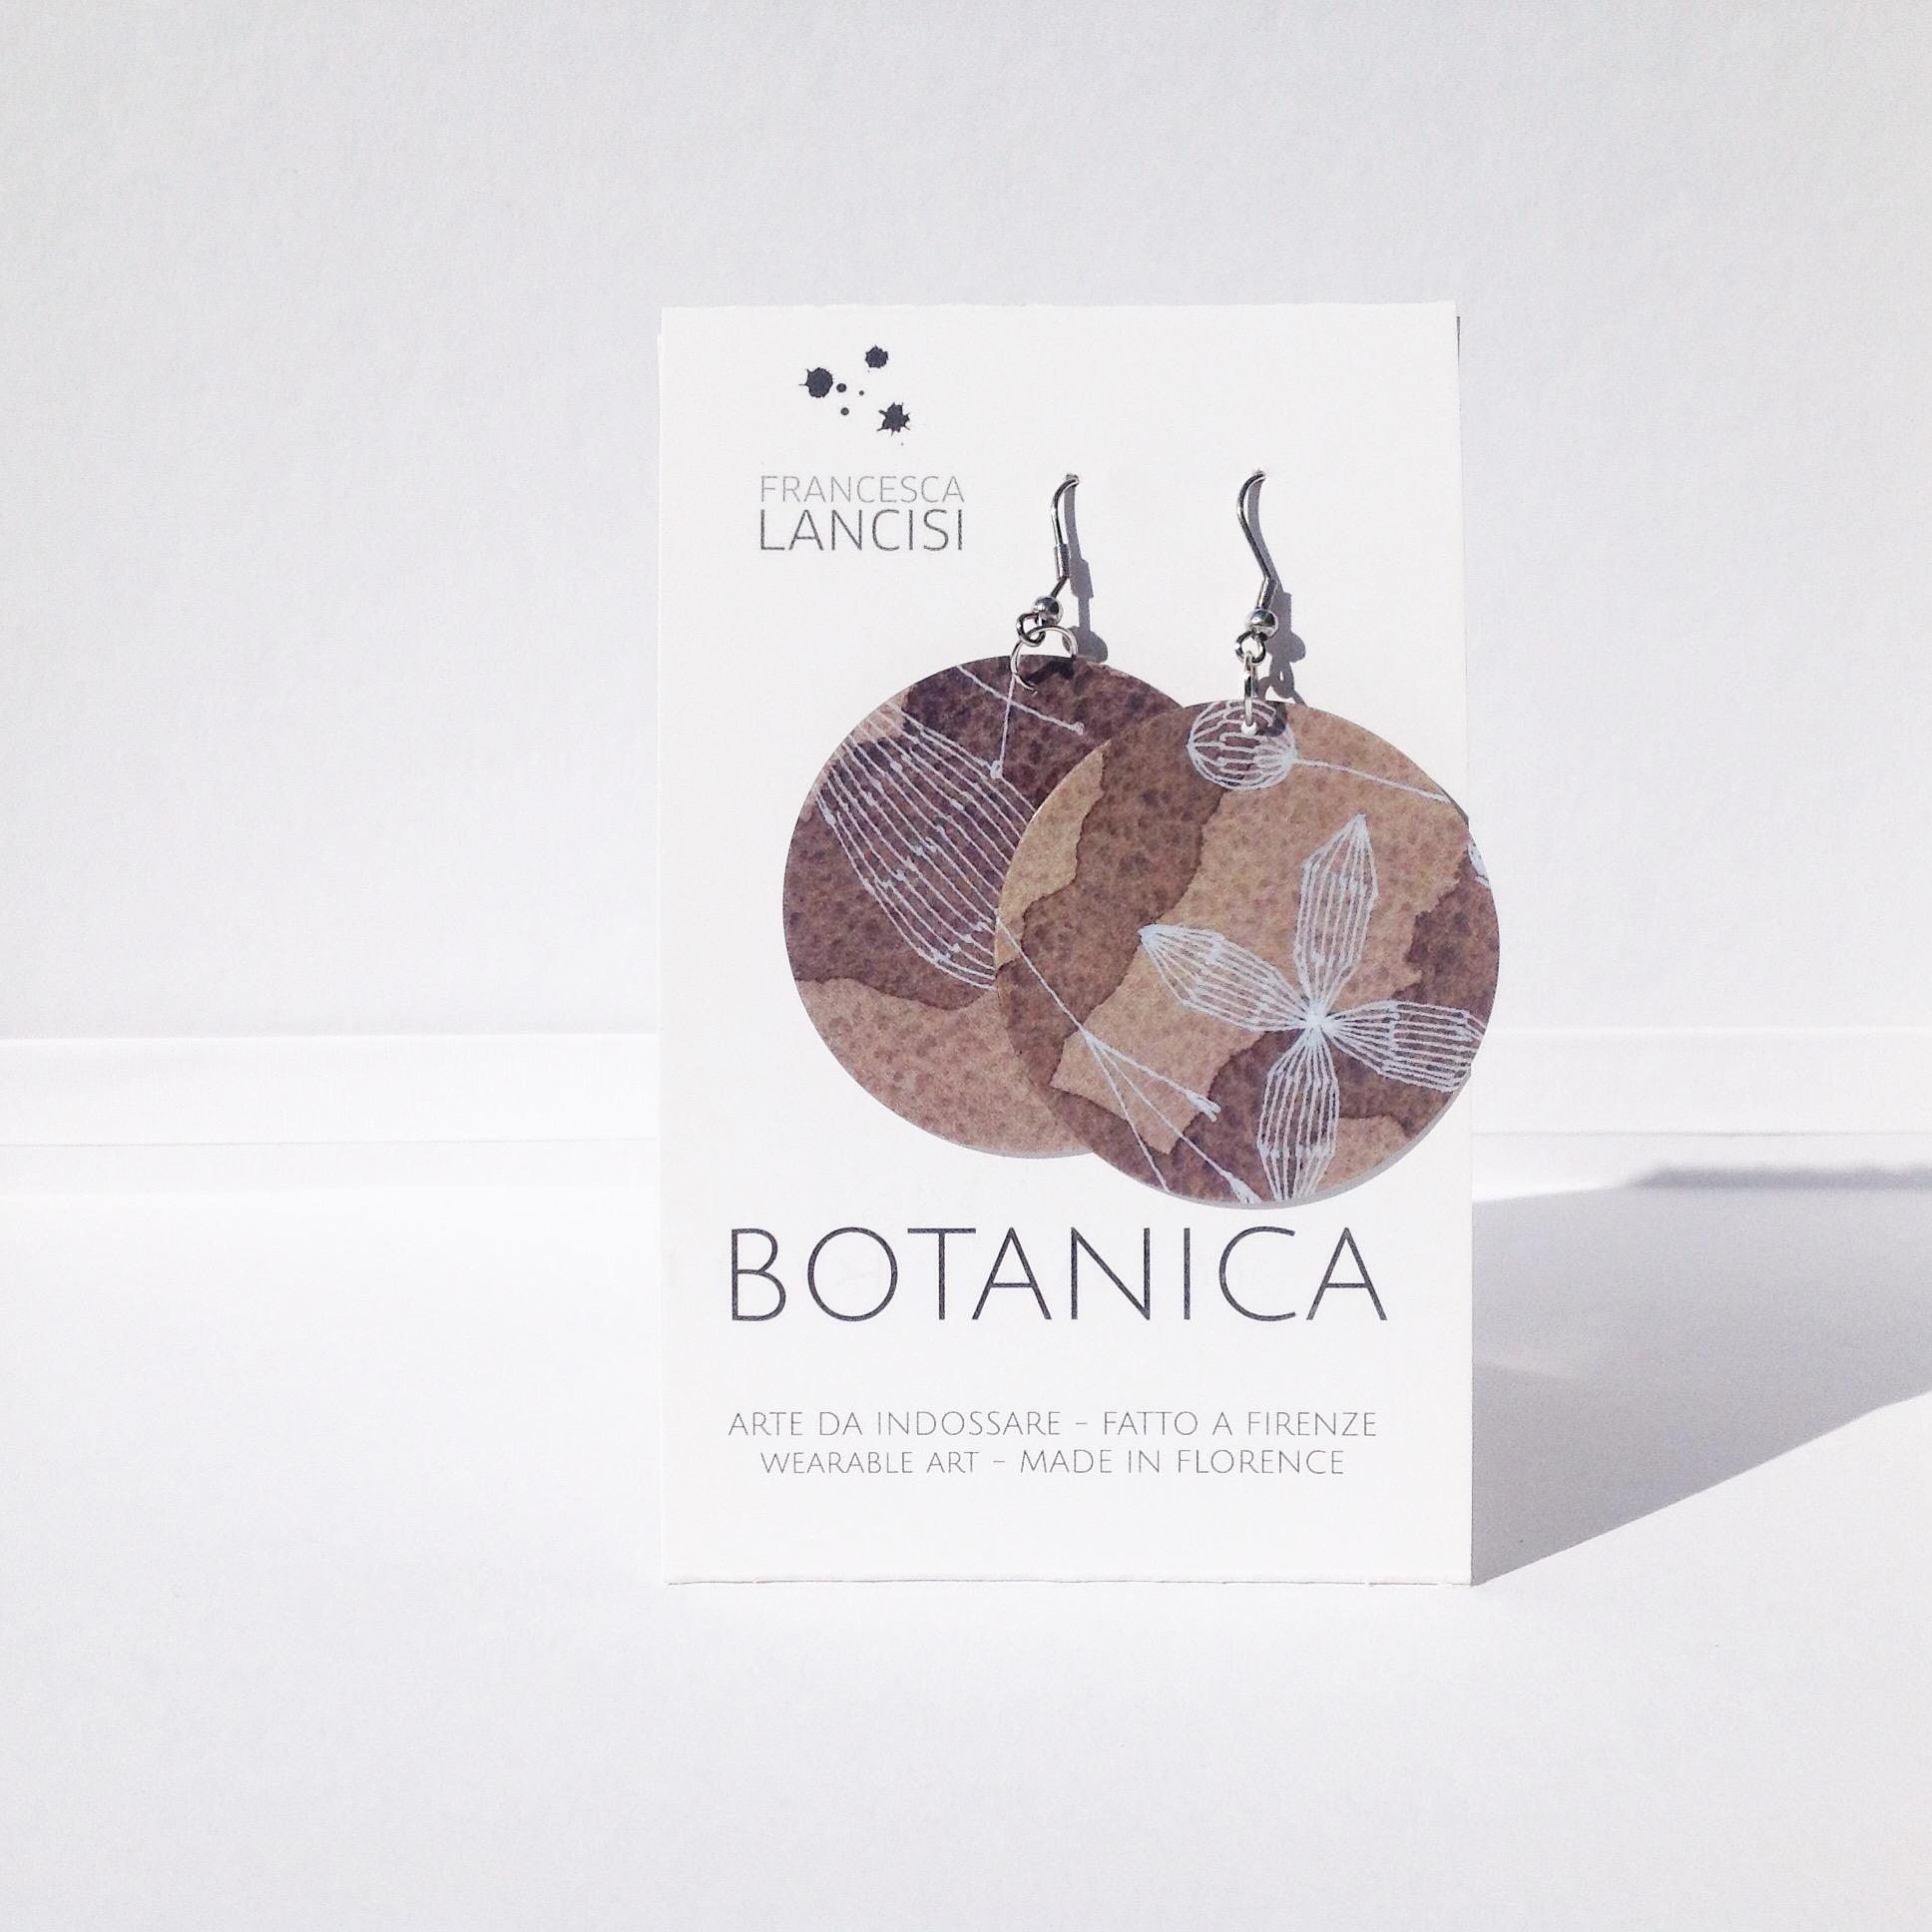 ORECCHINI BOTANICA FRANCESCA LANCISI (3).JPG